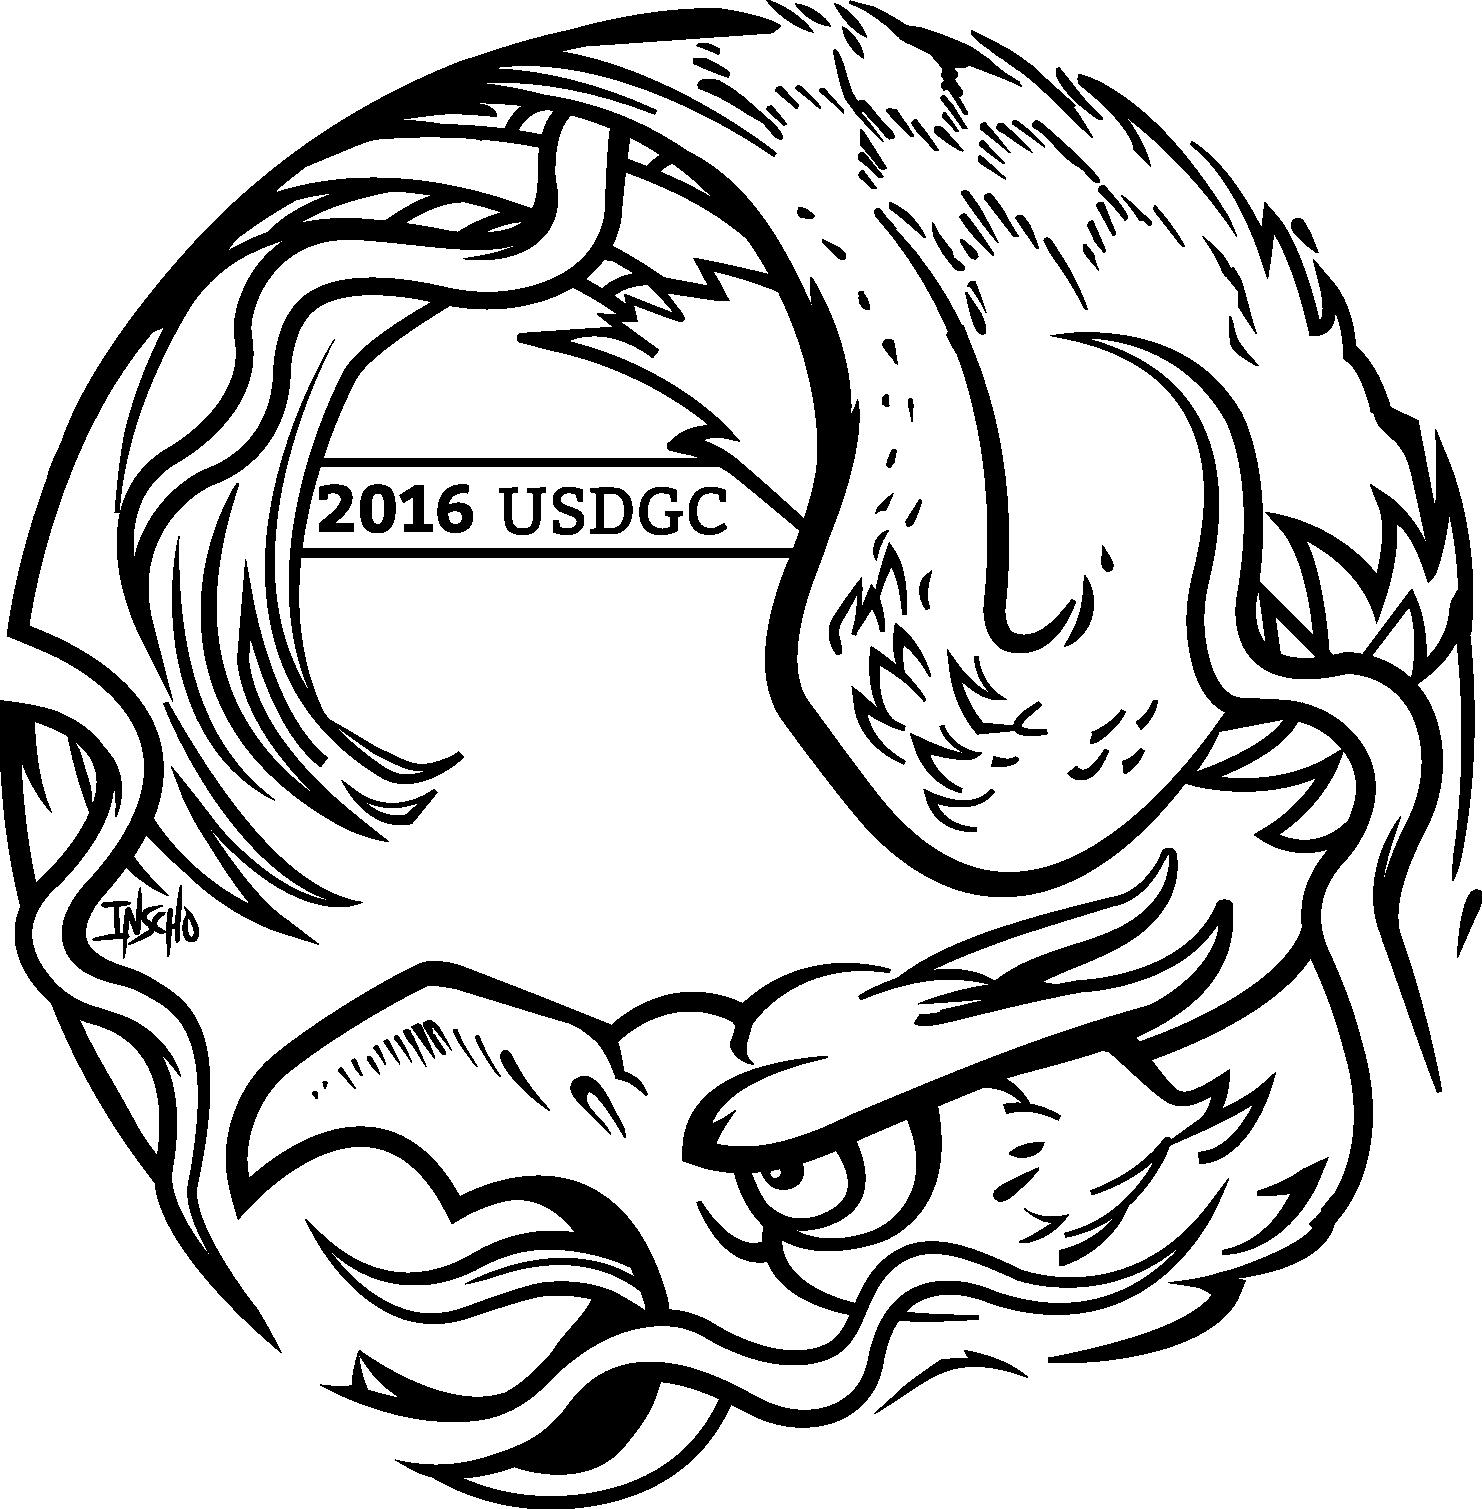 Inscho_USDGC2016_Design001_FINAL.jpg